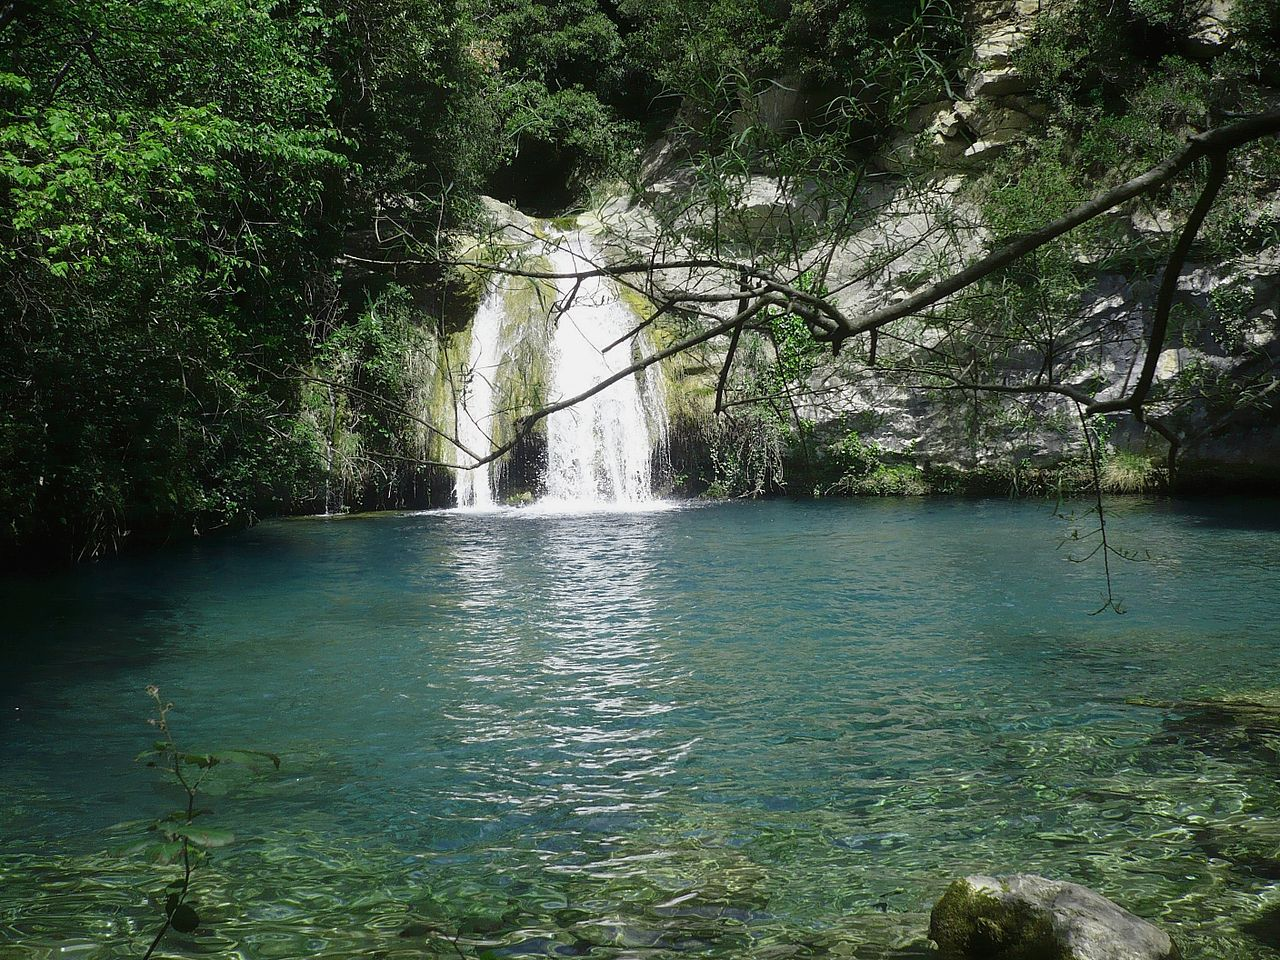 Poza del Gorg Blau de Sant Aniol d'Aguja